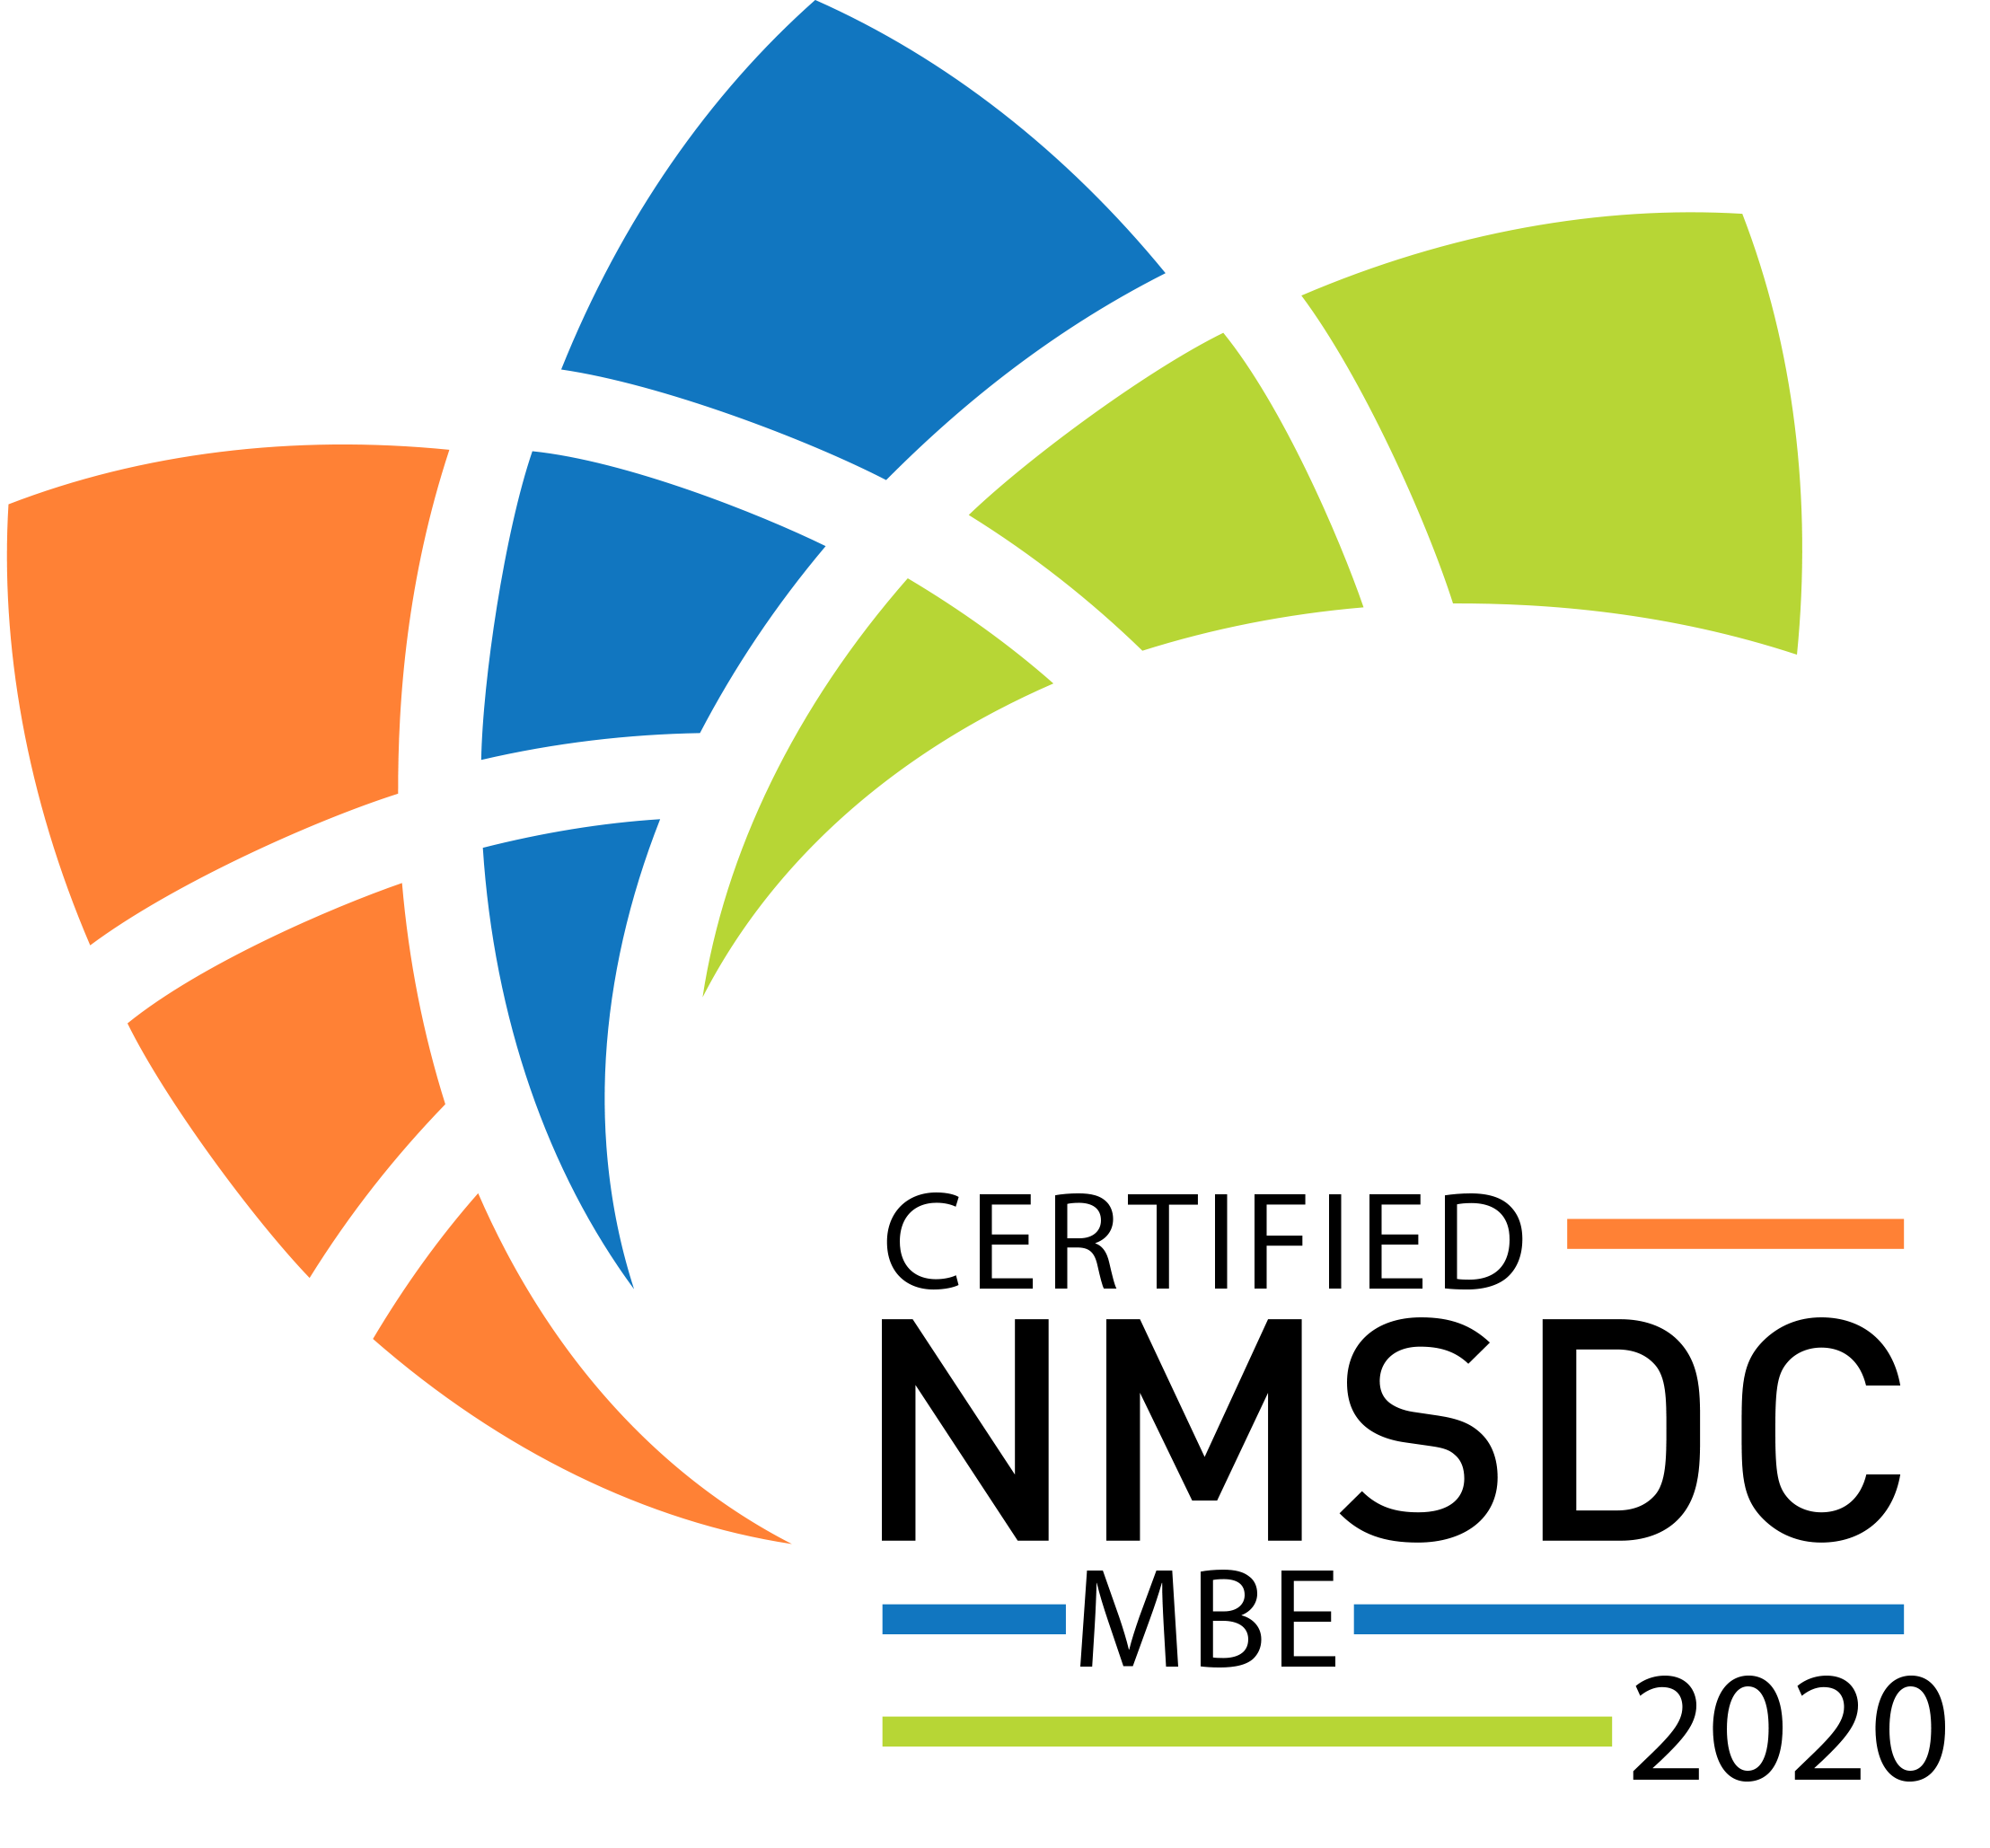 CMRSDC 2020 Certified Logo